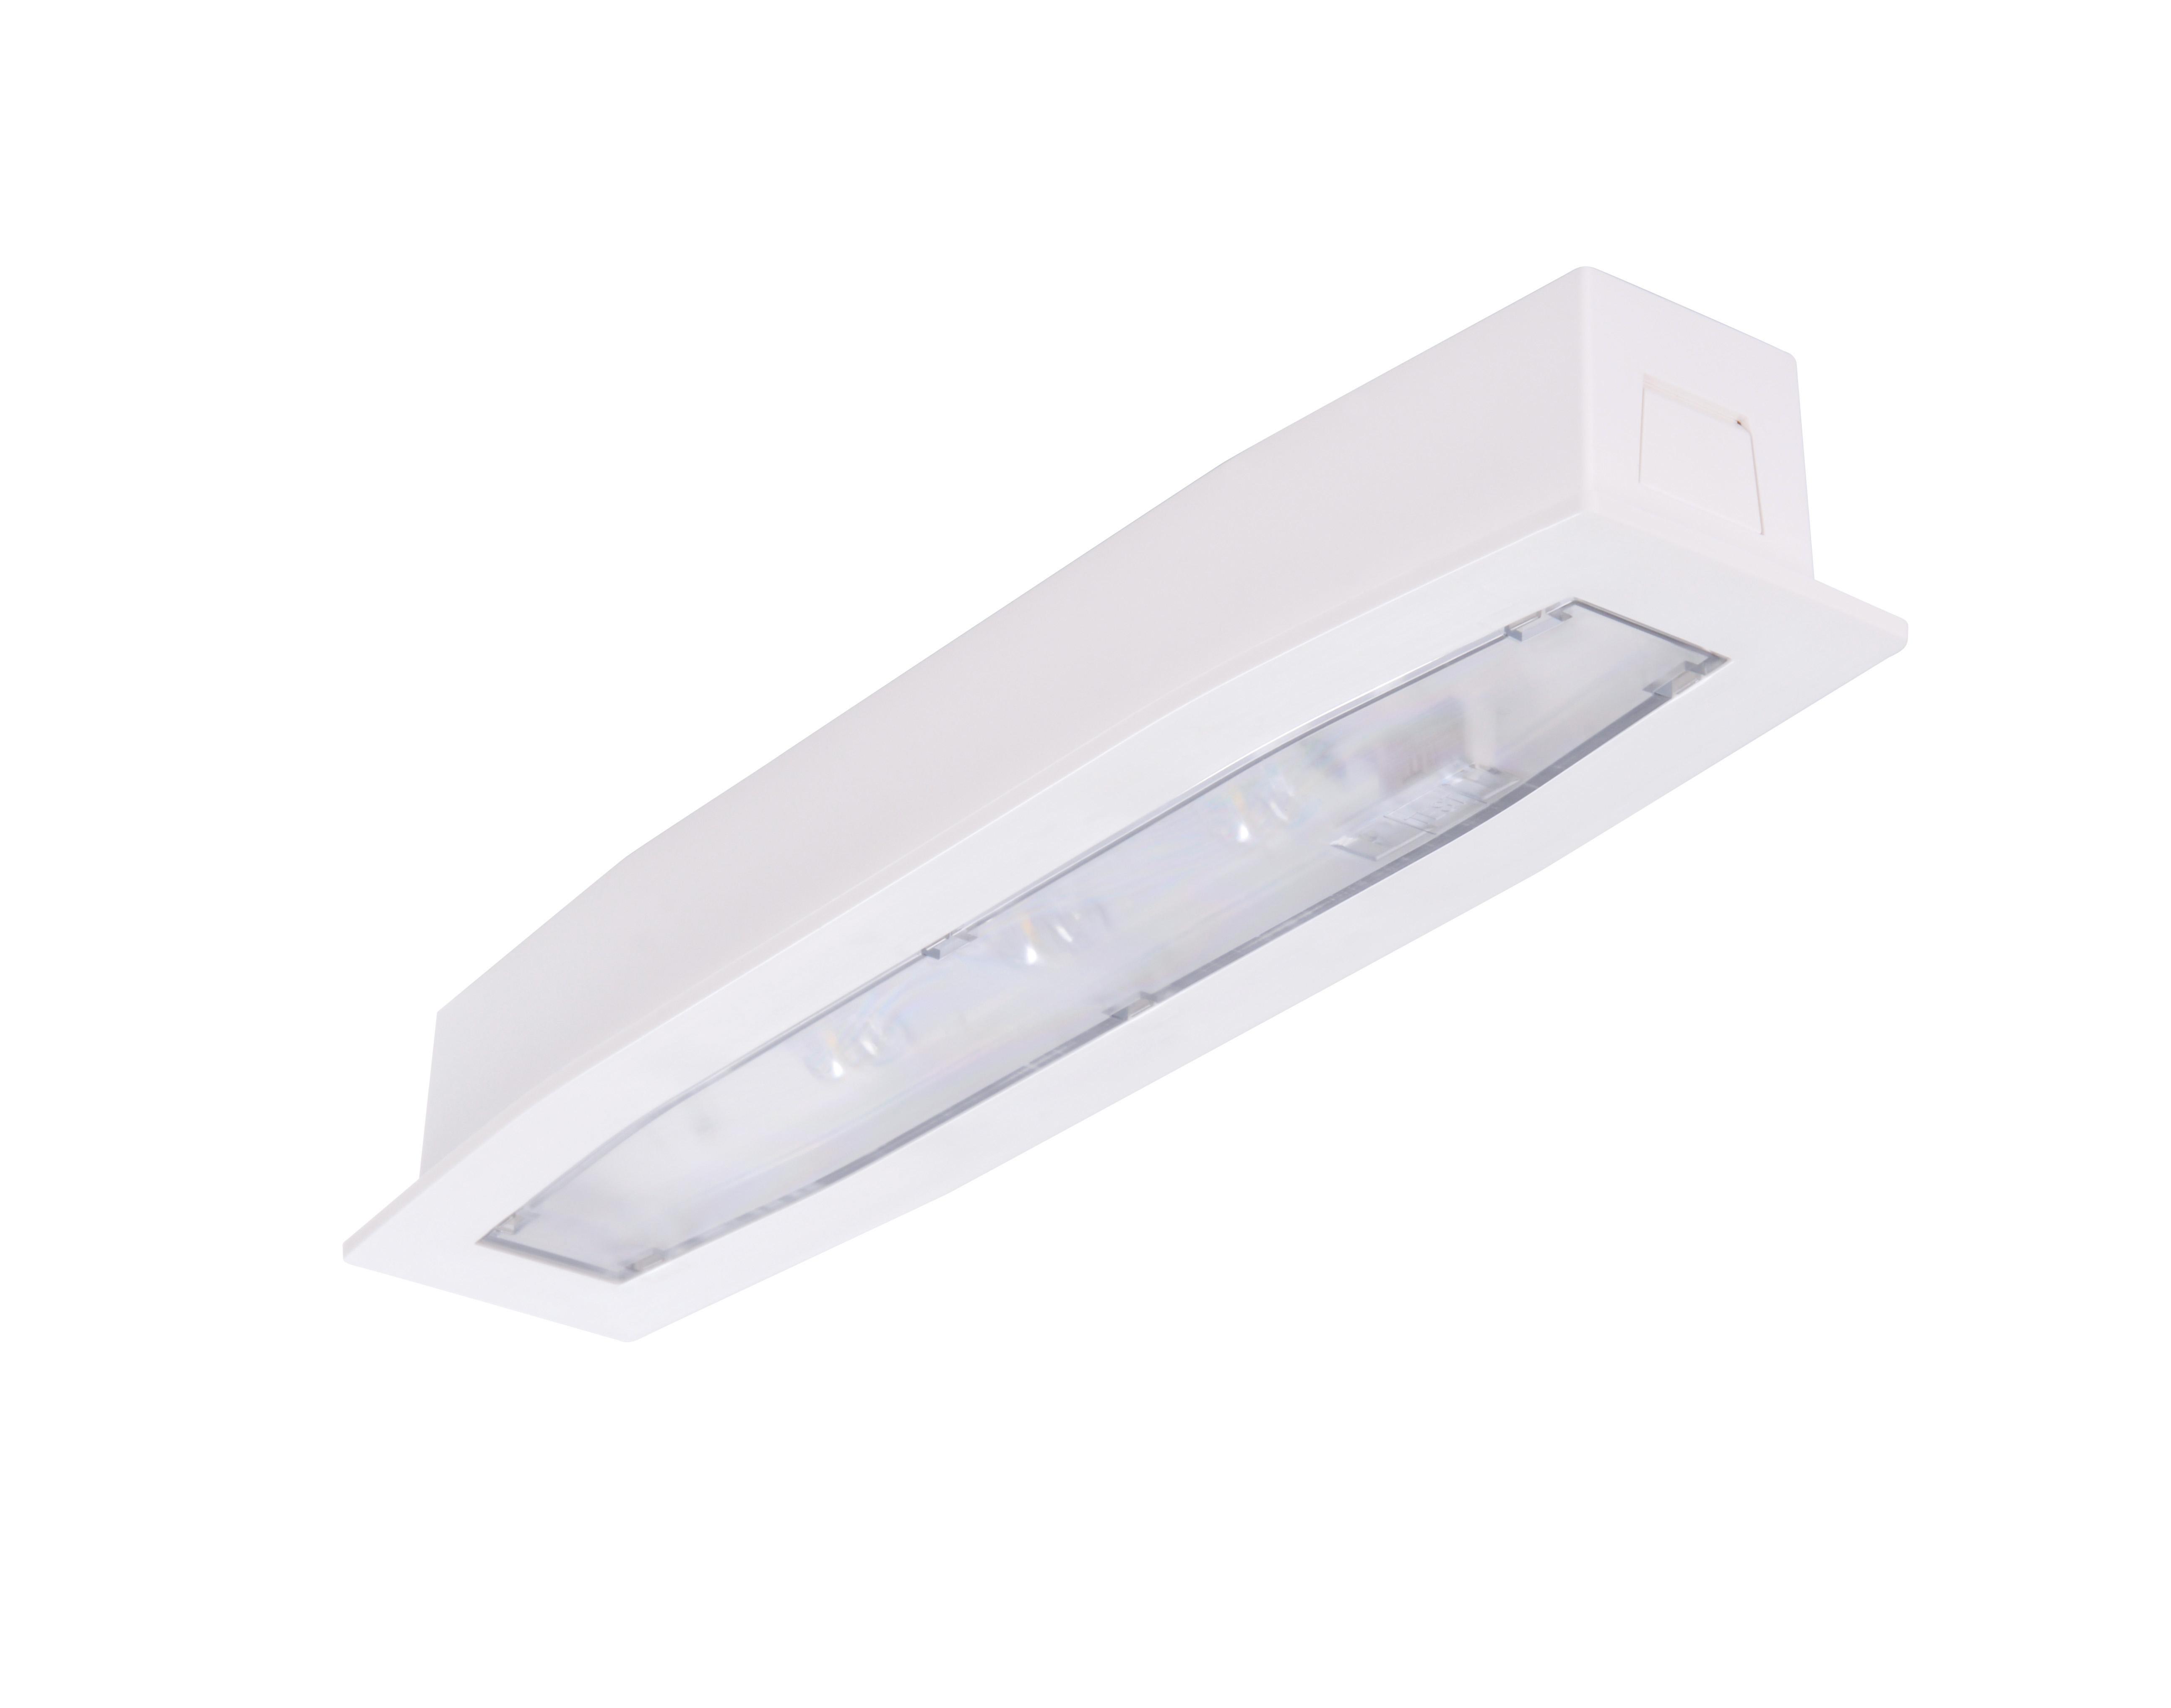 Lampa emergenta led Intelight 94504   3h mentinut test automat 3